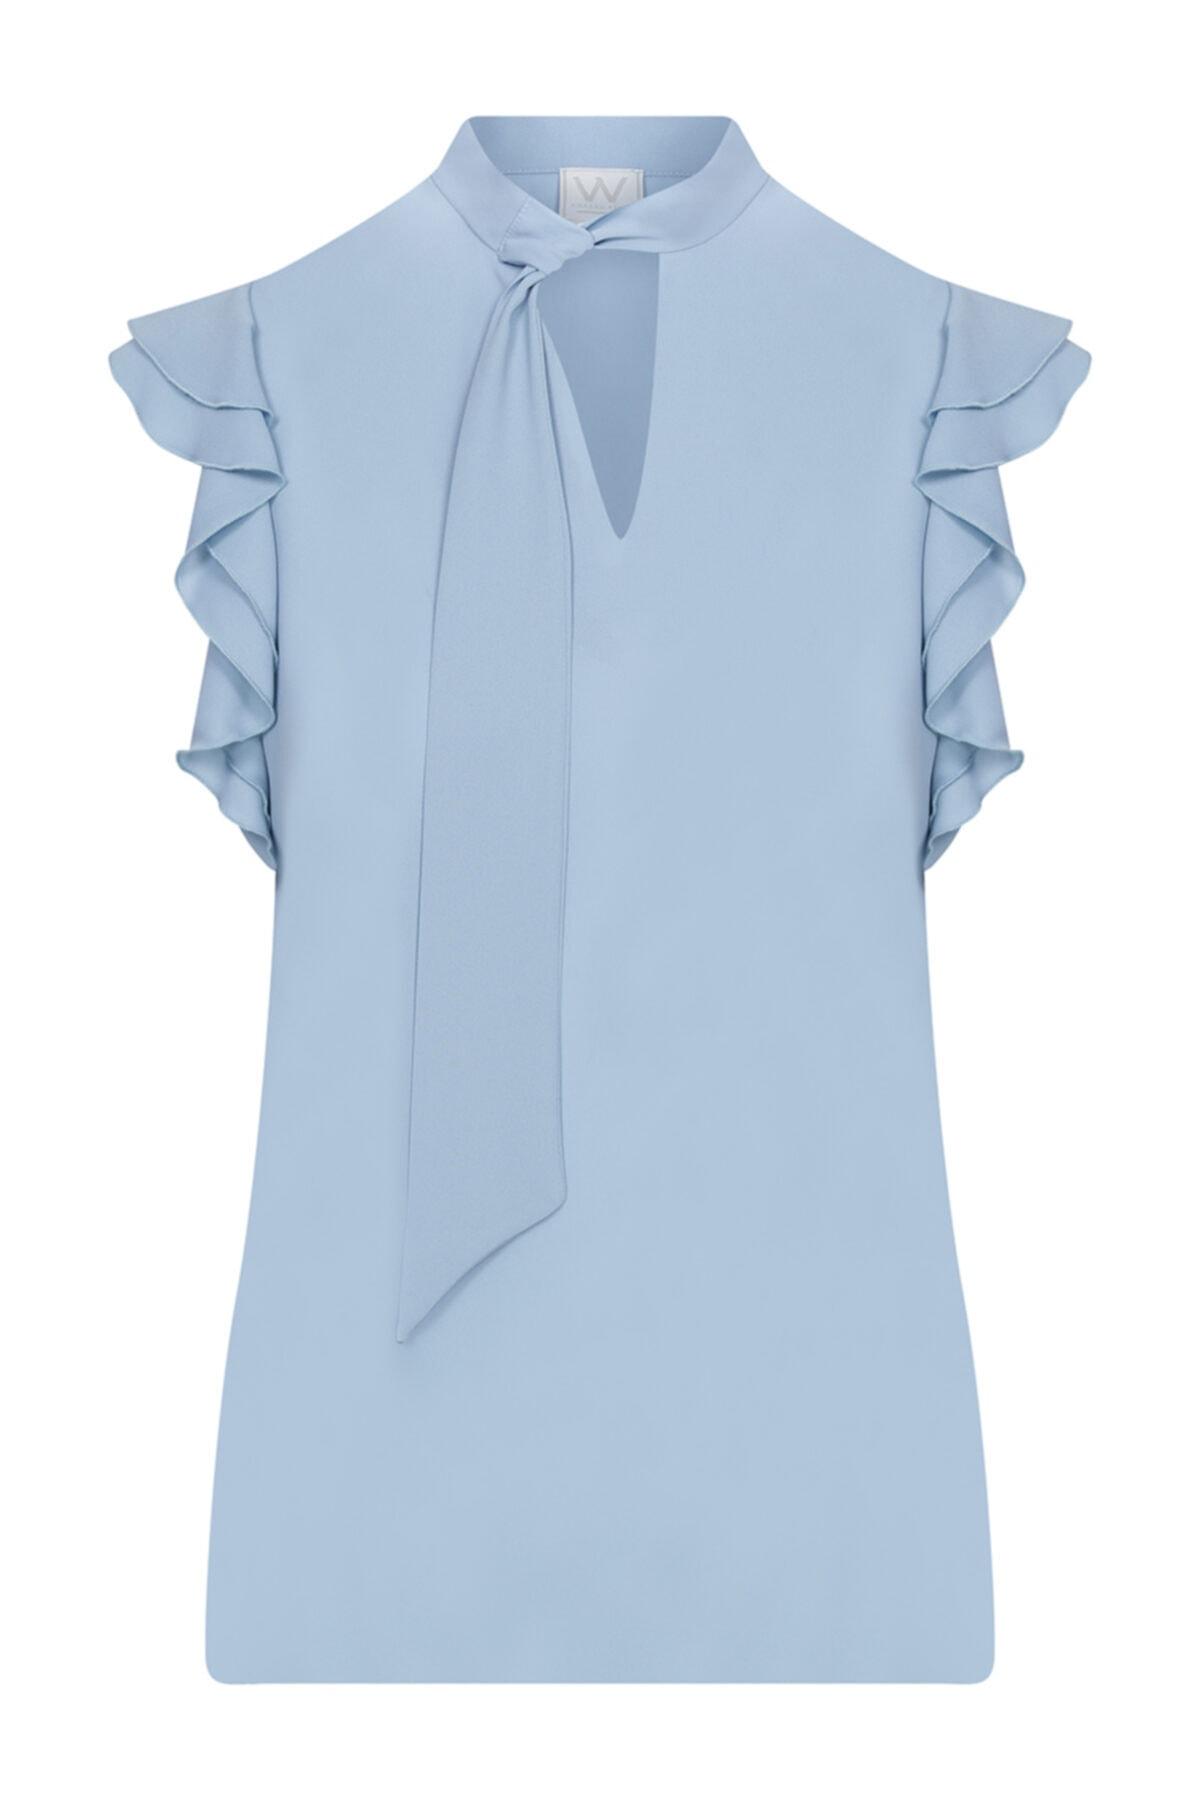 W Collection Kolsuz Şifon Bluz 1